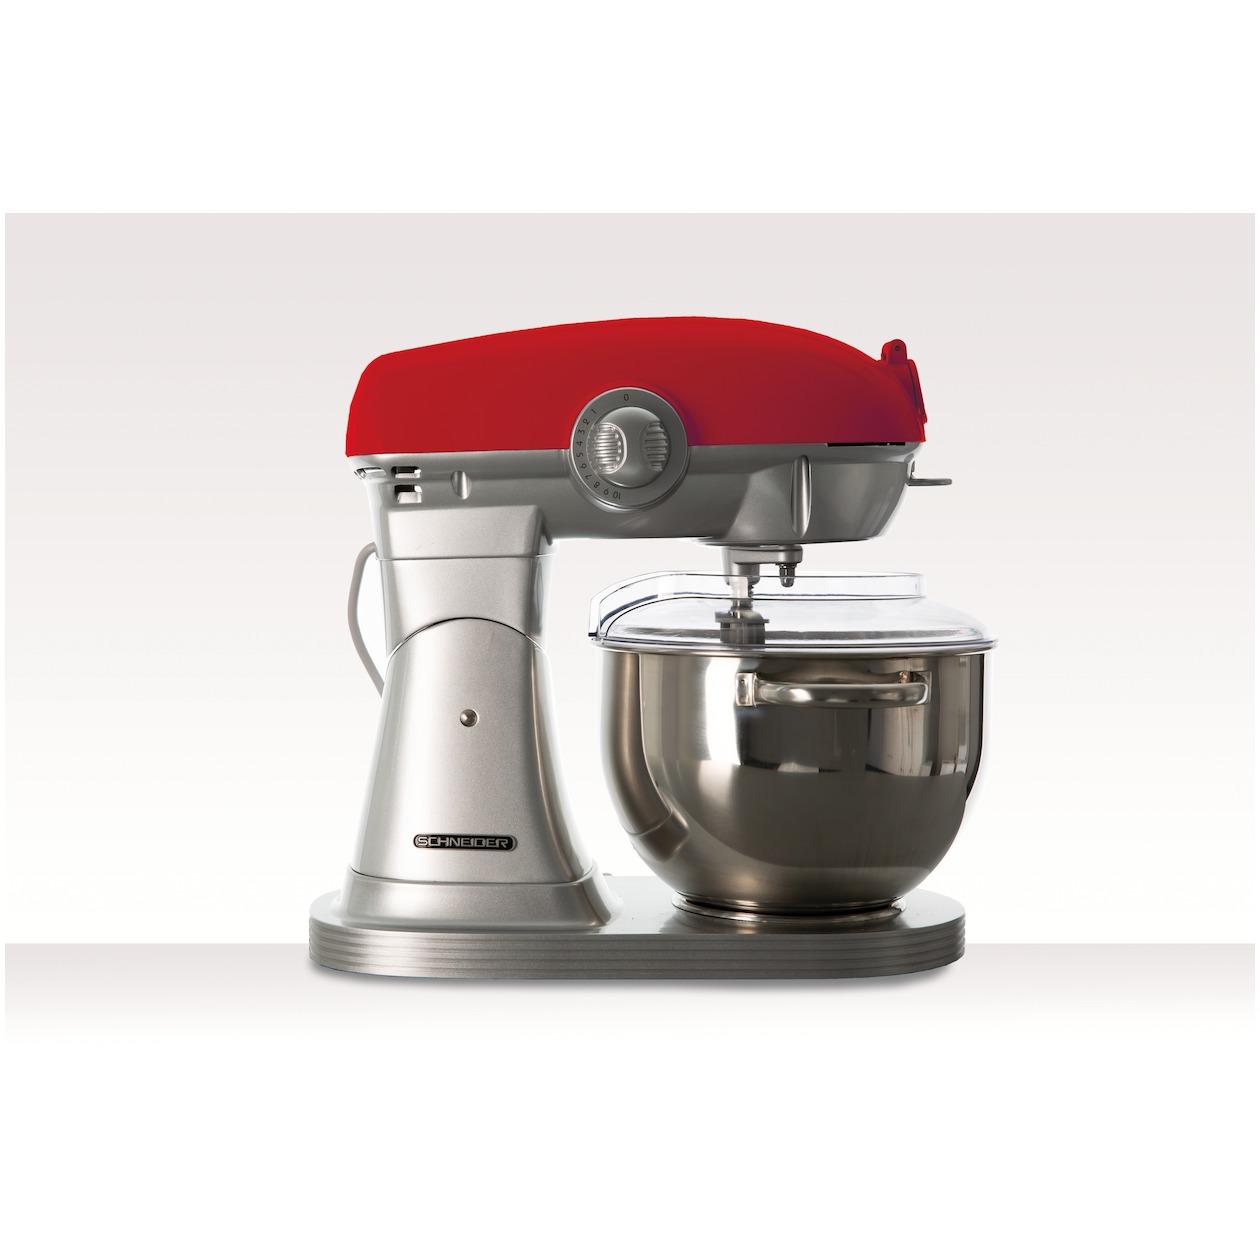 Schneider keukenmachine SCFP57R rood - Prijsvergelijk